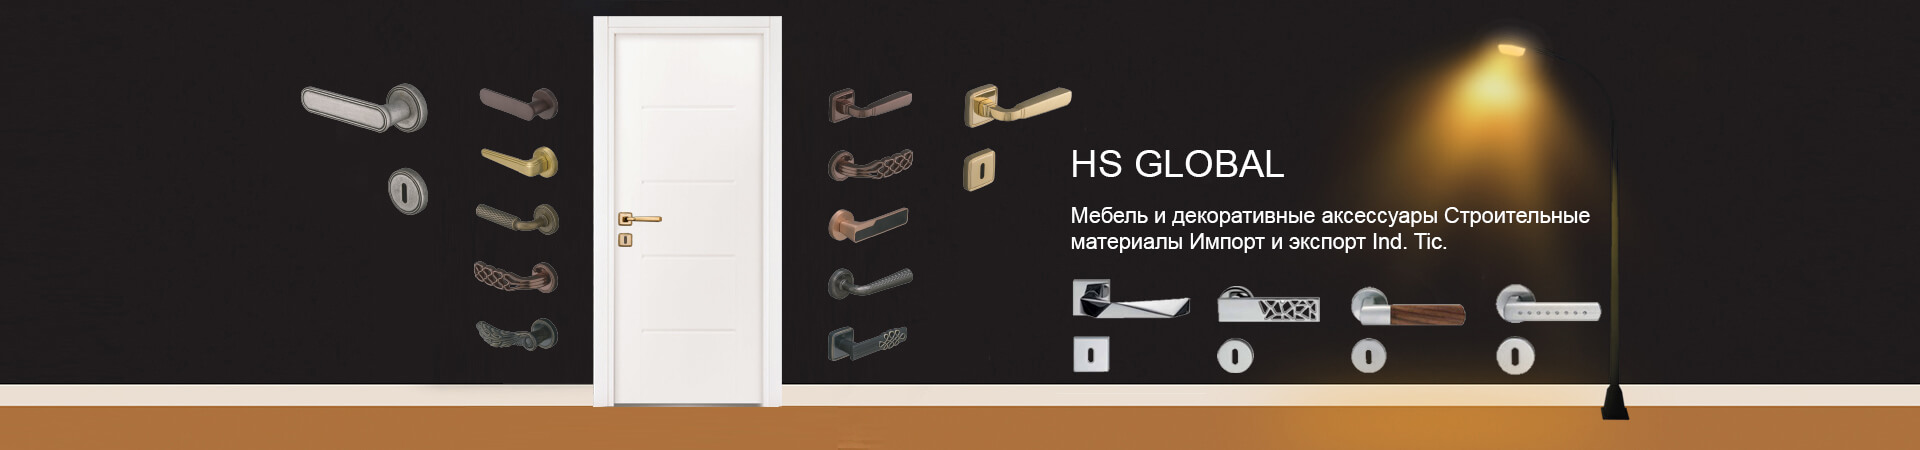 hs global